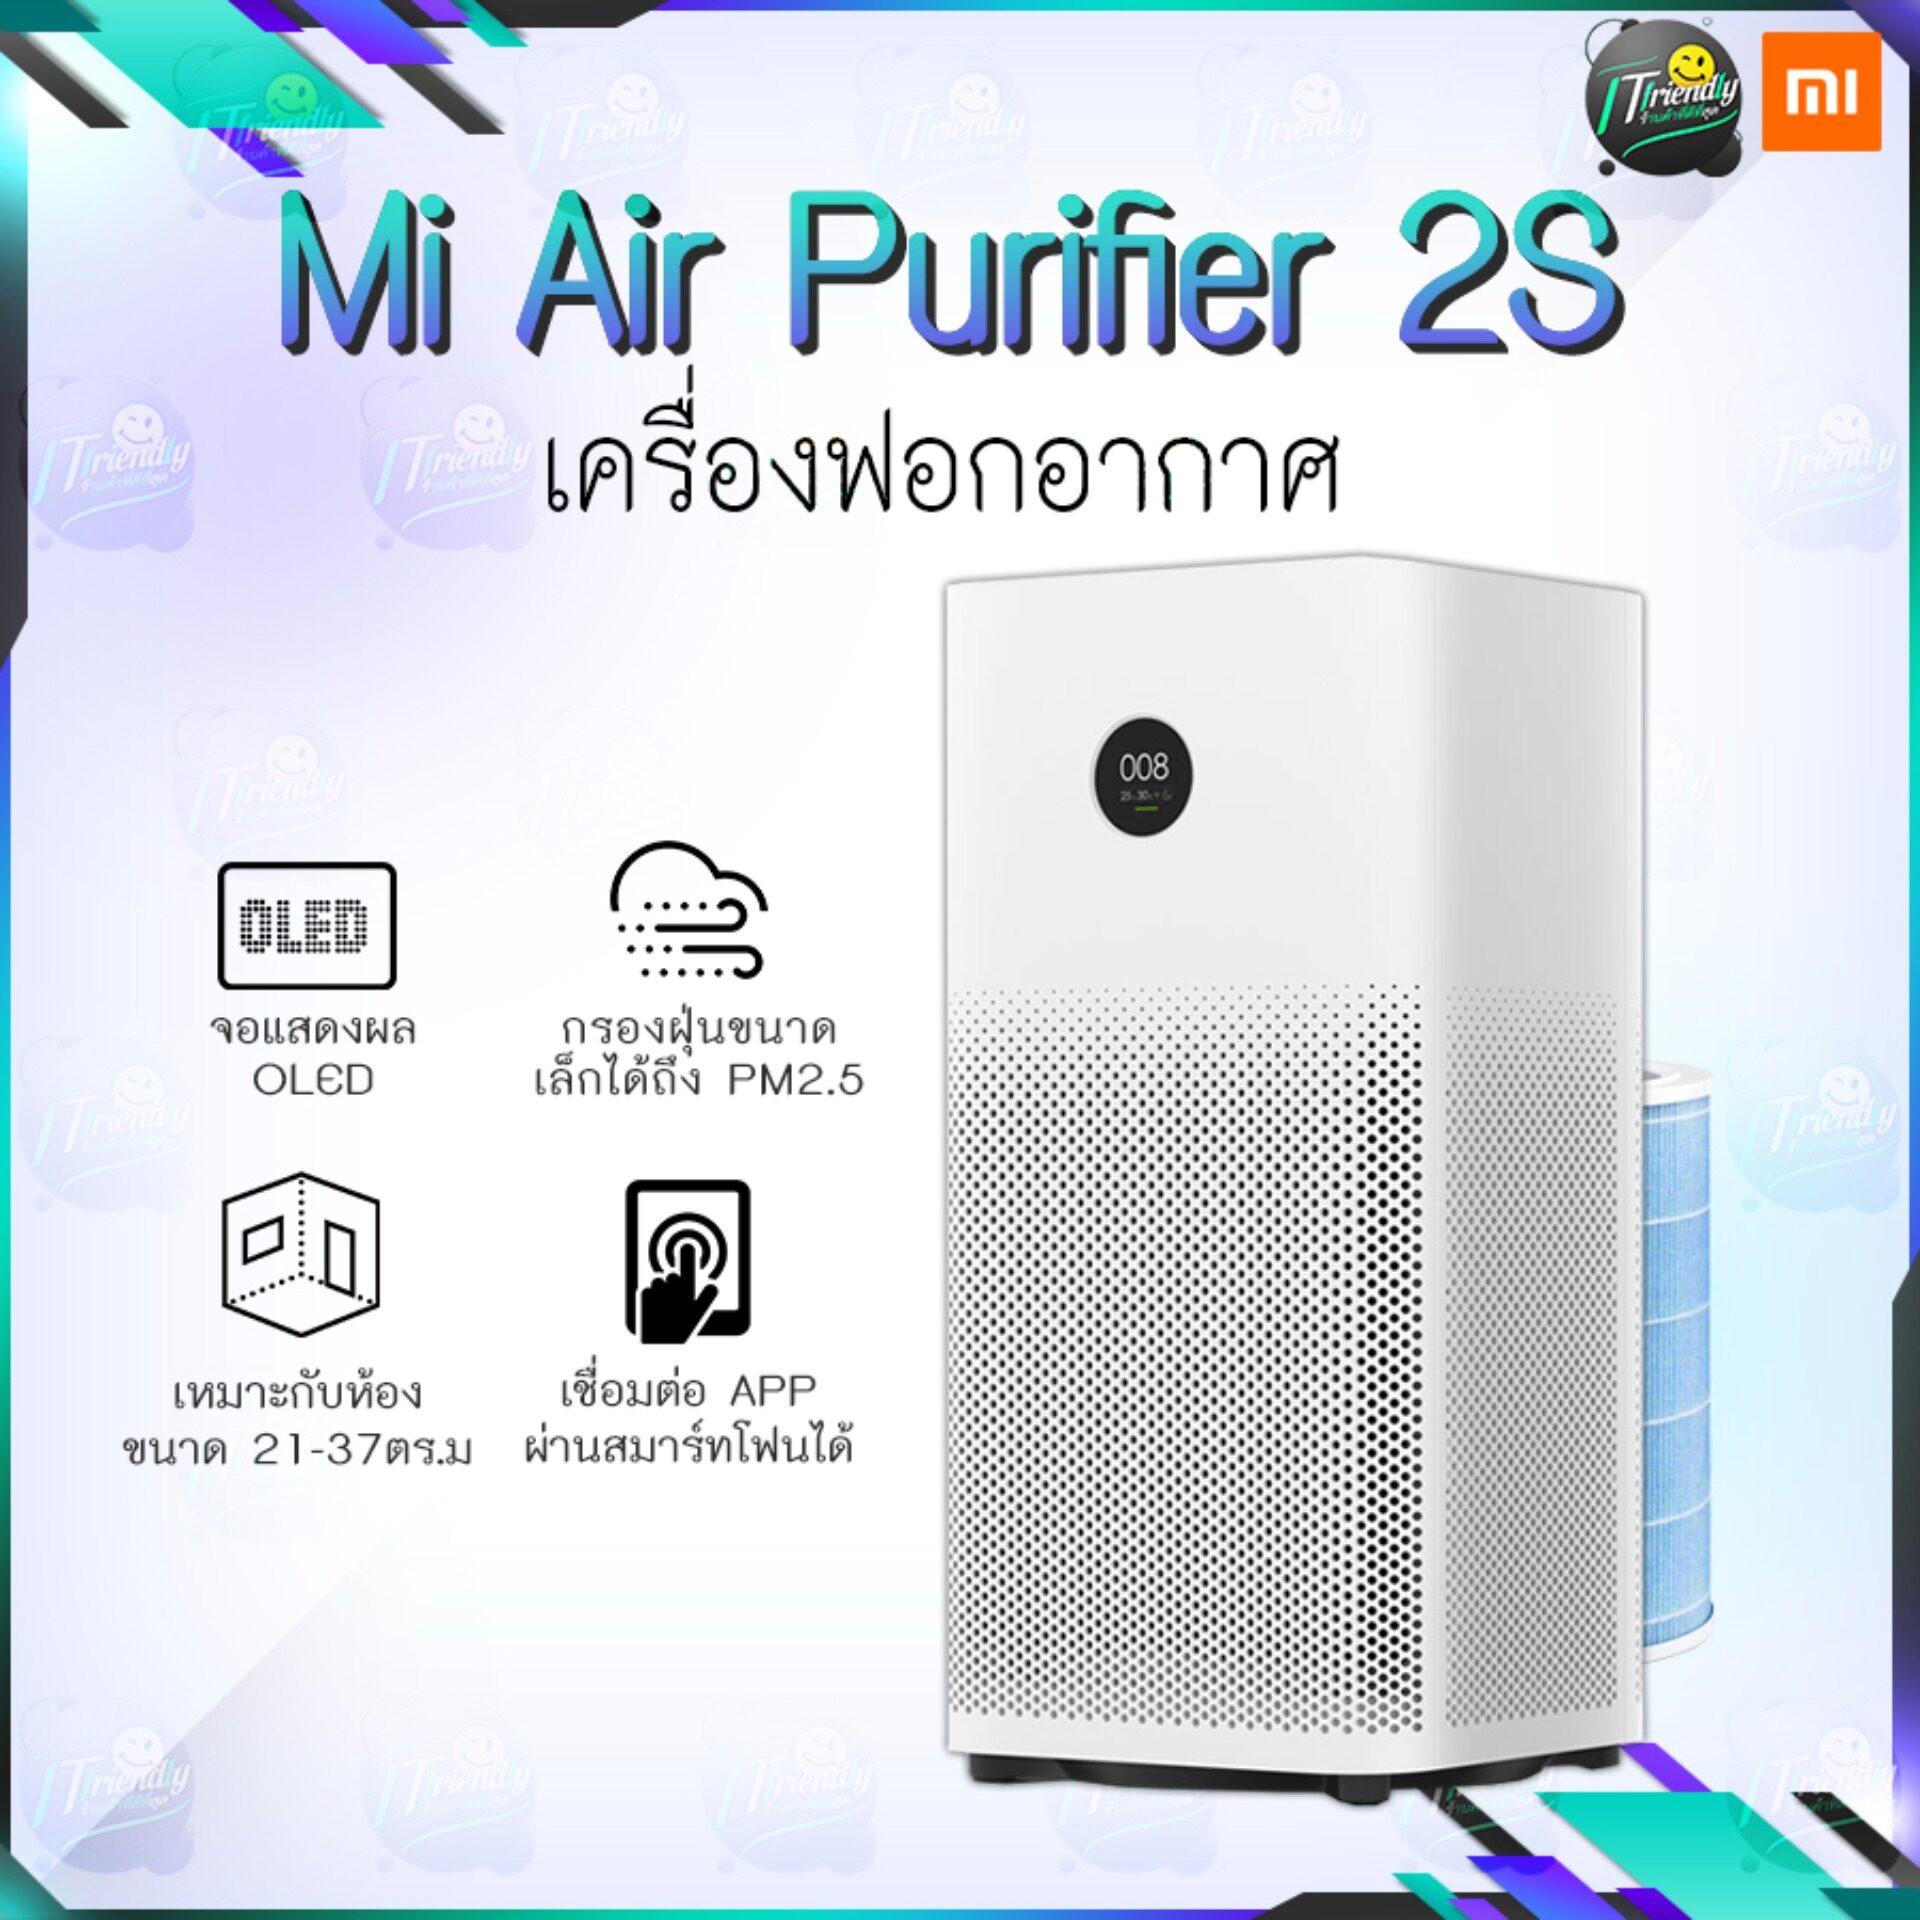 Xiaomi Mi Air Purifier 2s ฟอกมลพิษ กรองฝุ่น กรองอากาศเชื่อโรคต่างๆ เครื่องฟอกอากาศที่เป็นมิตรต่อสิ่งแวดล้อมมาพร้อมไส้กรองสีฟ้าในตัวเครื่อง [รับประกันร้าน 1 ปี]